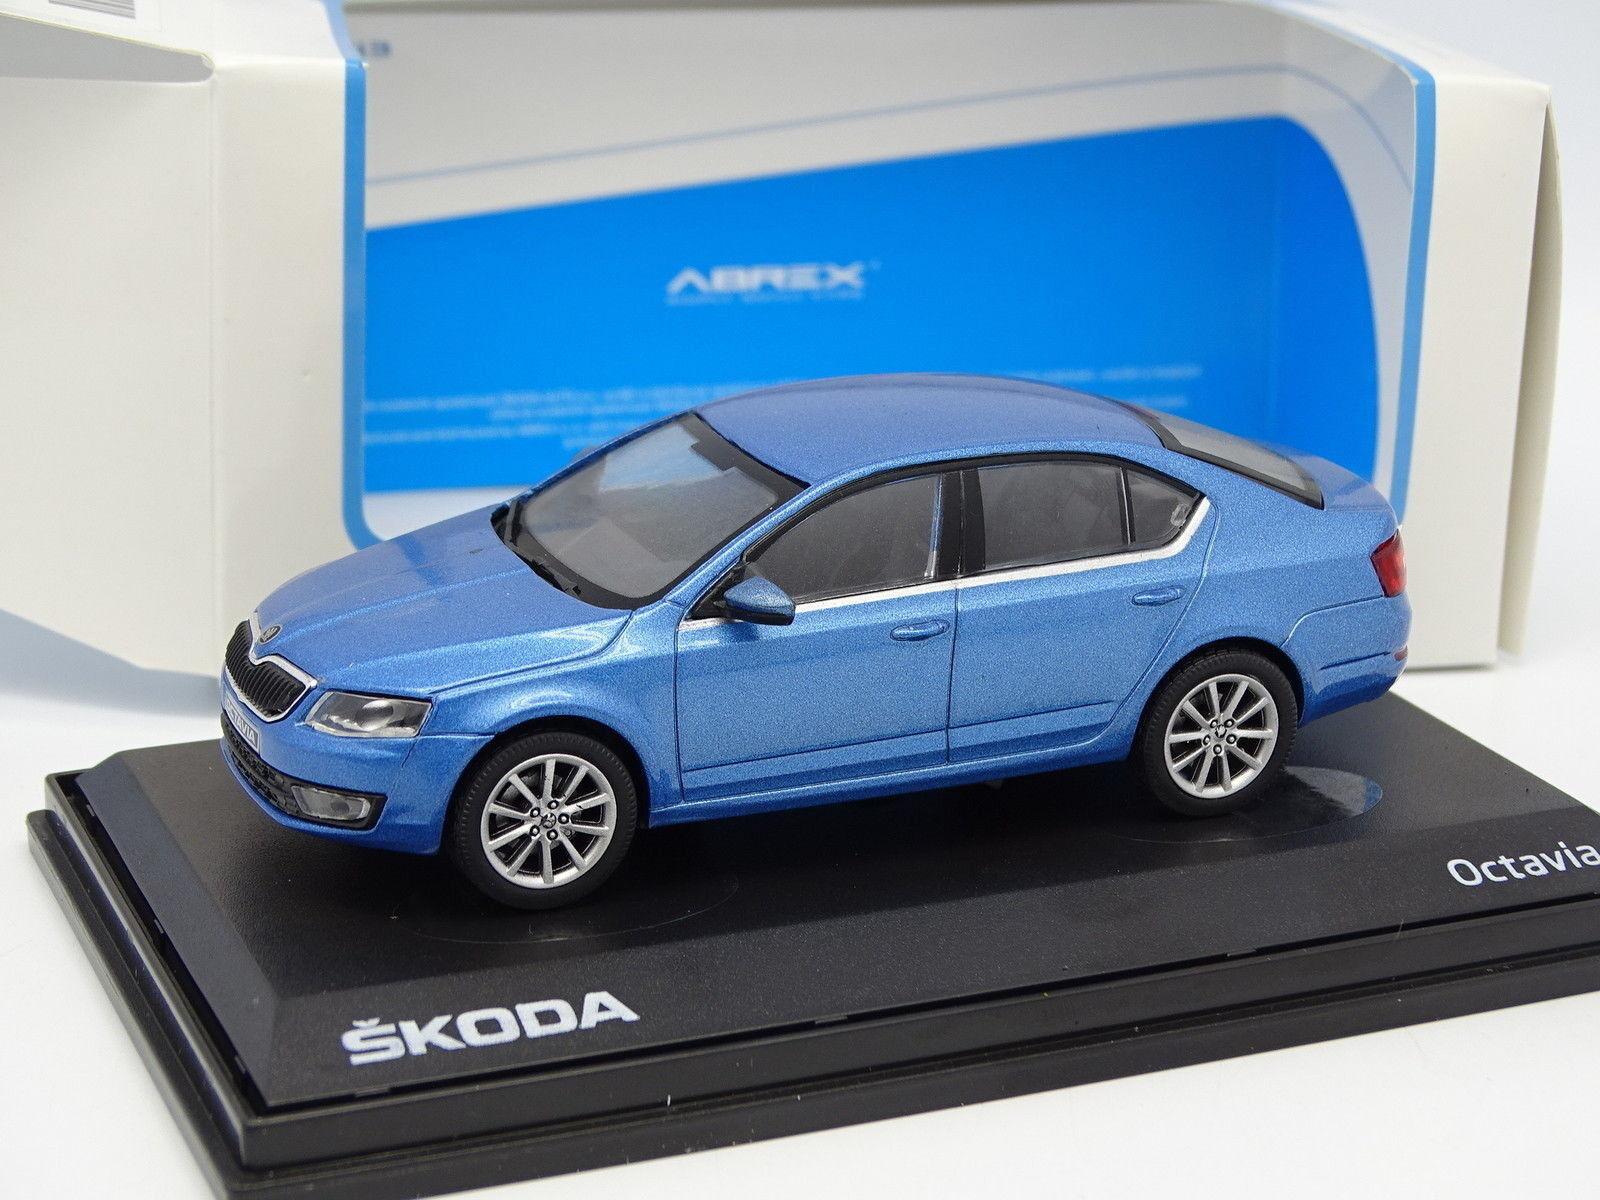 perfezionare Abrex 1 43 - Skoda Octavia Octavia Octavia Blu  all'ingrosso a buon mercato